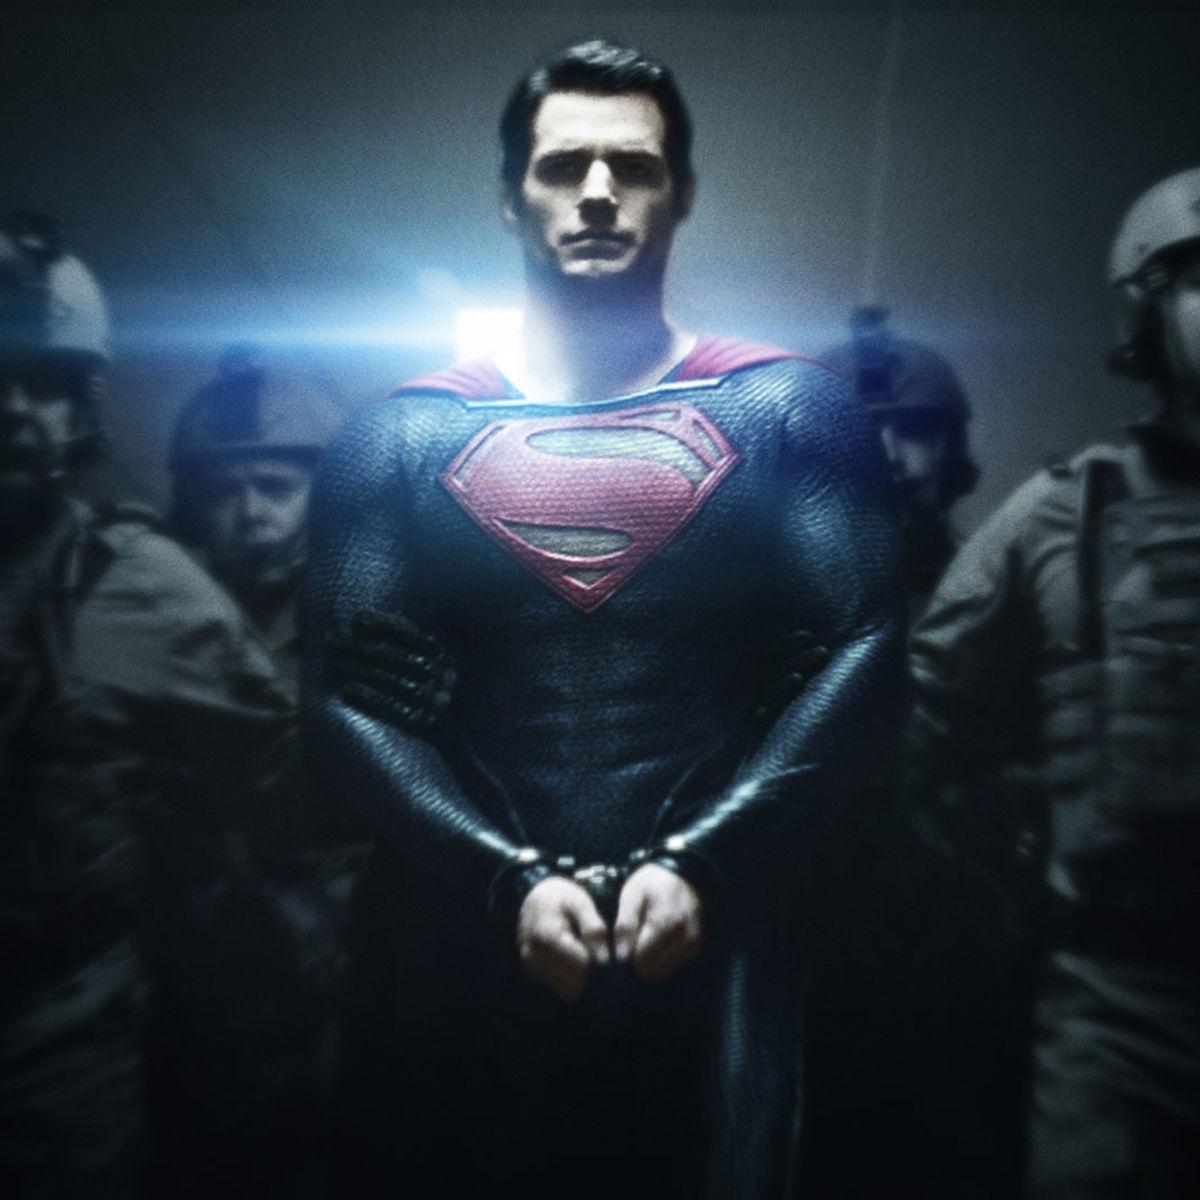 Man of steel villain name